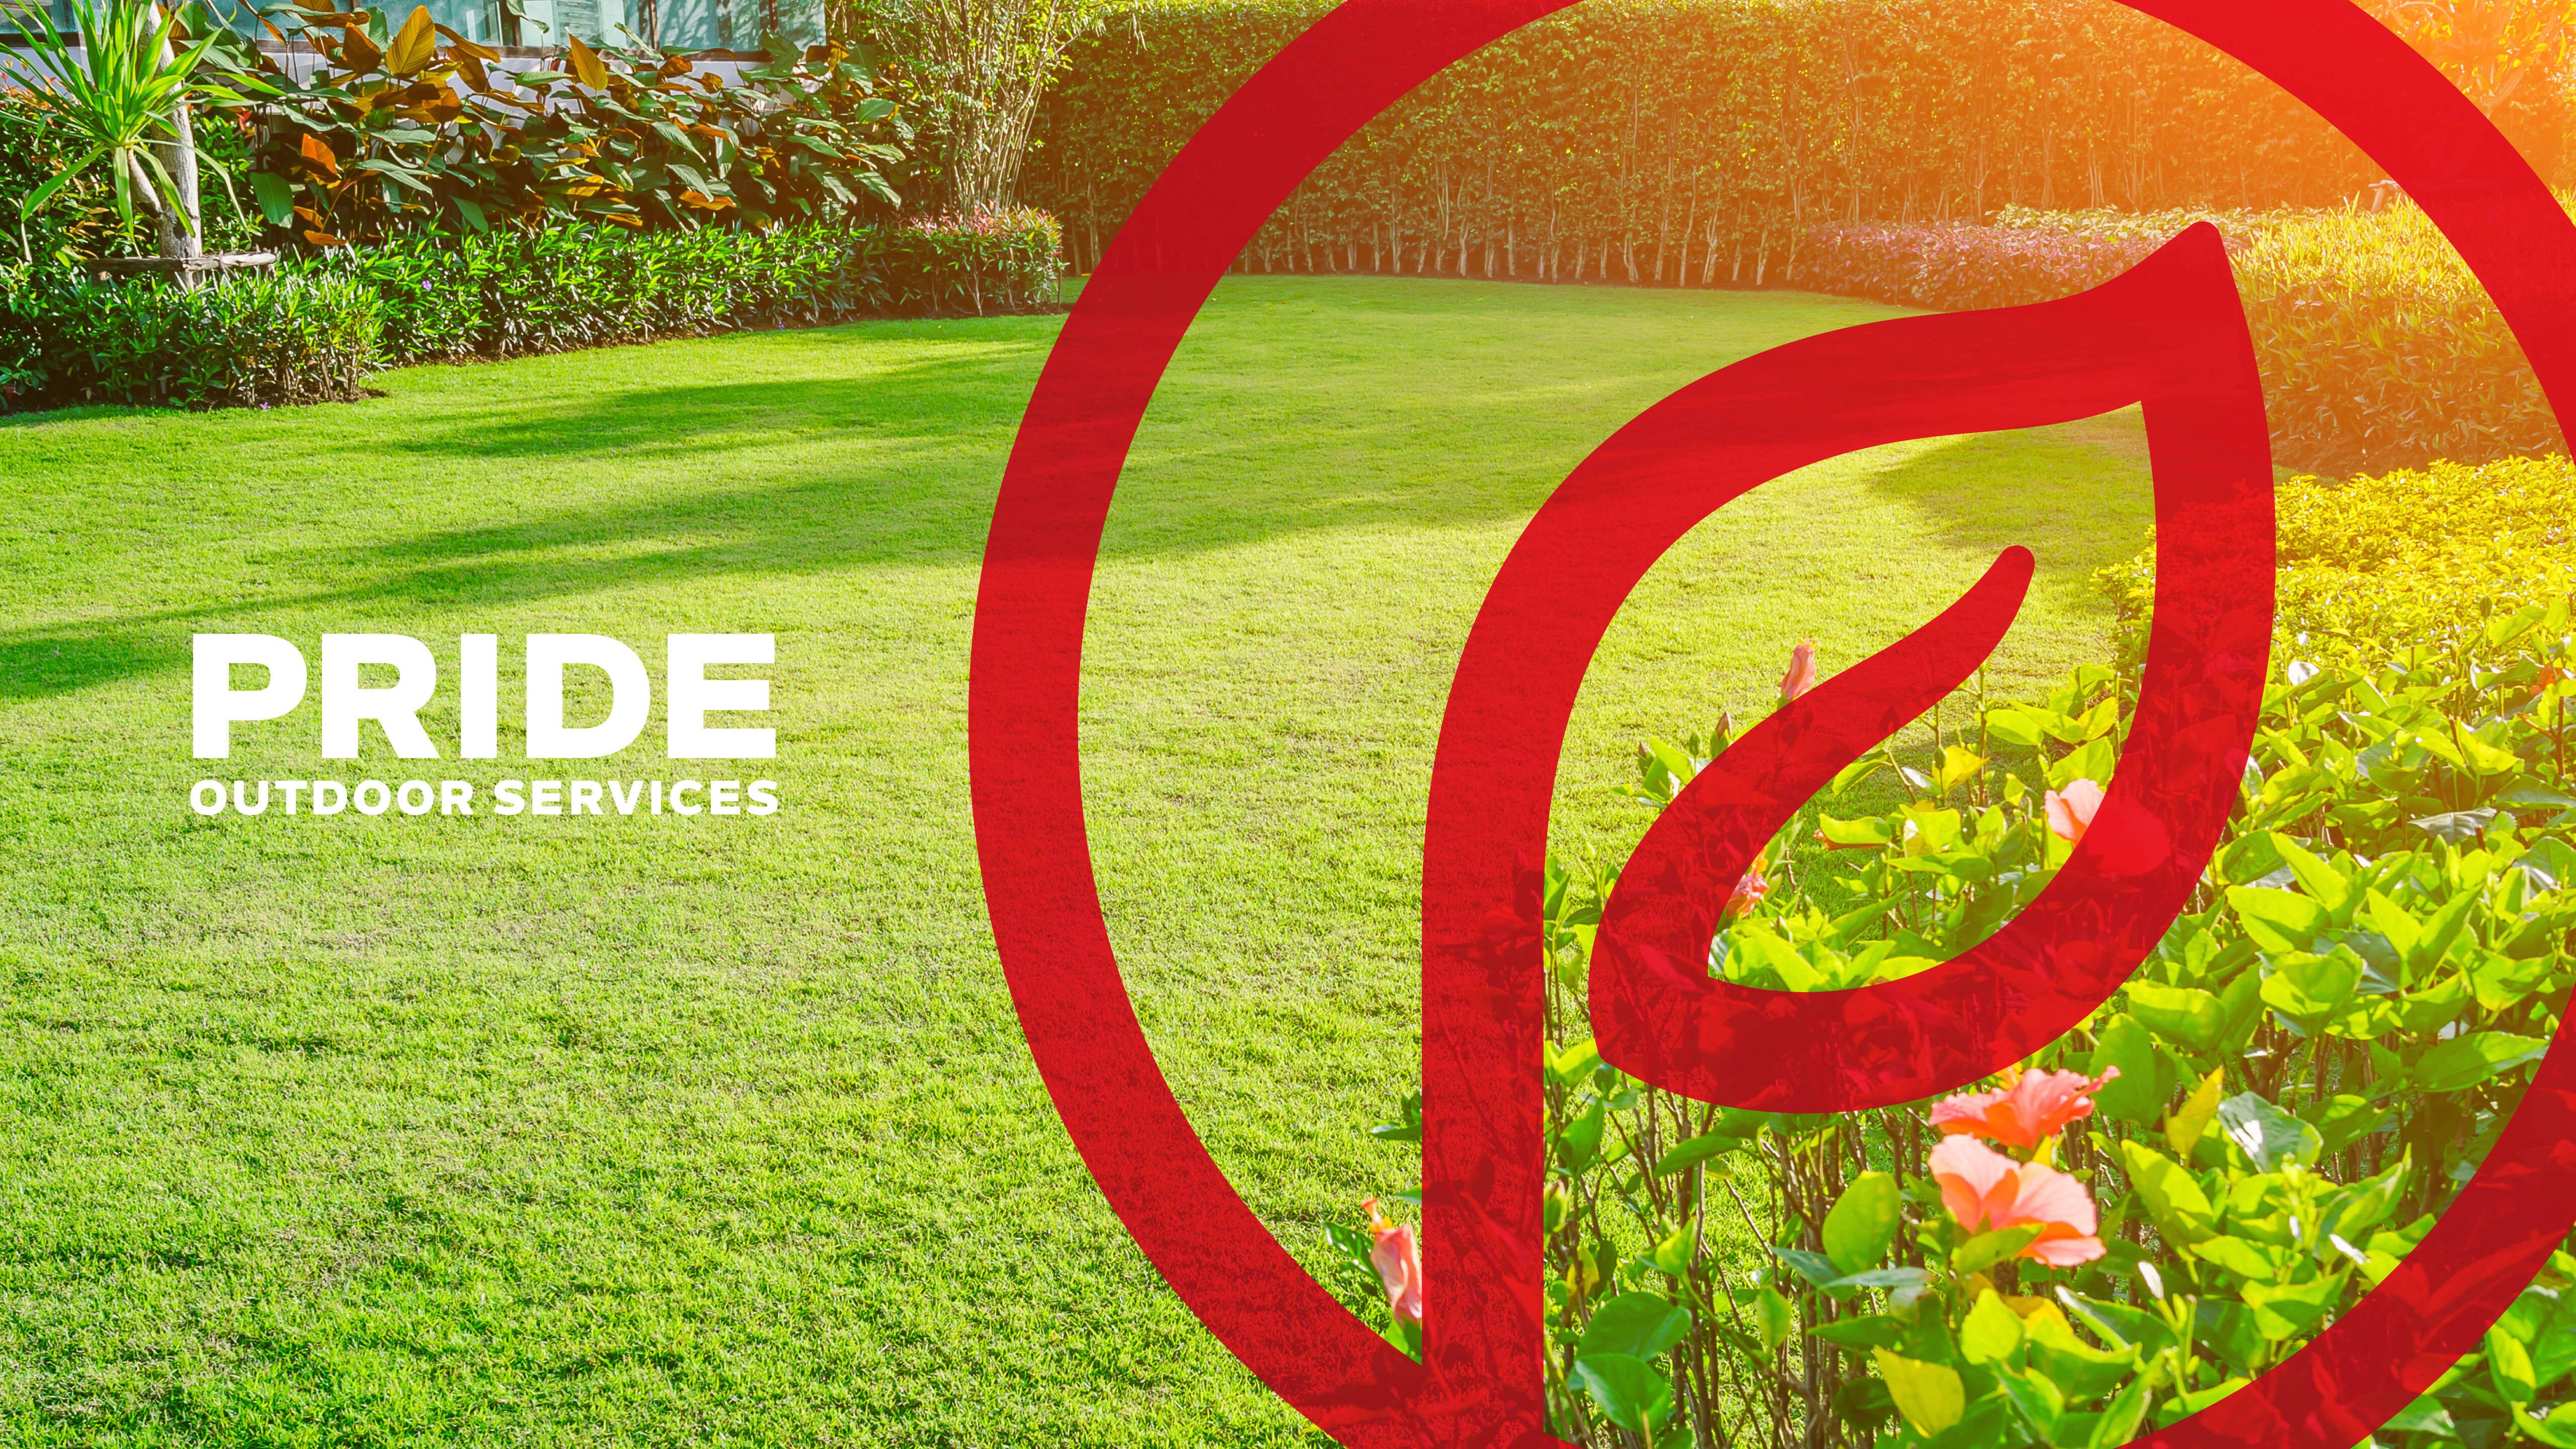 Pride Outdoor Services   New Branding